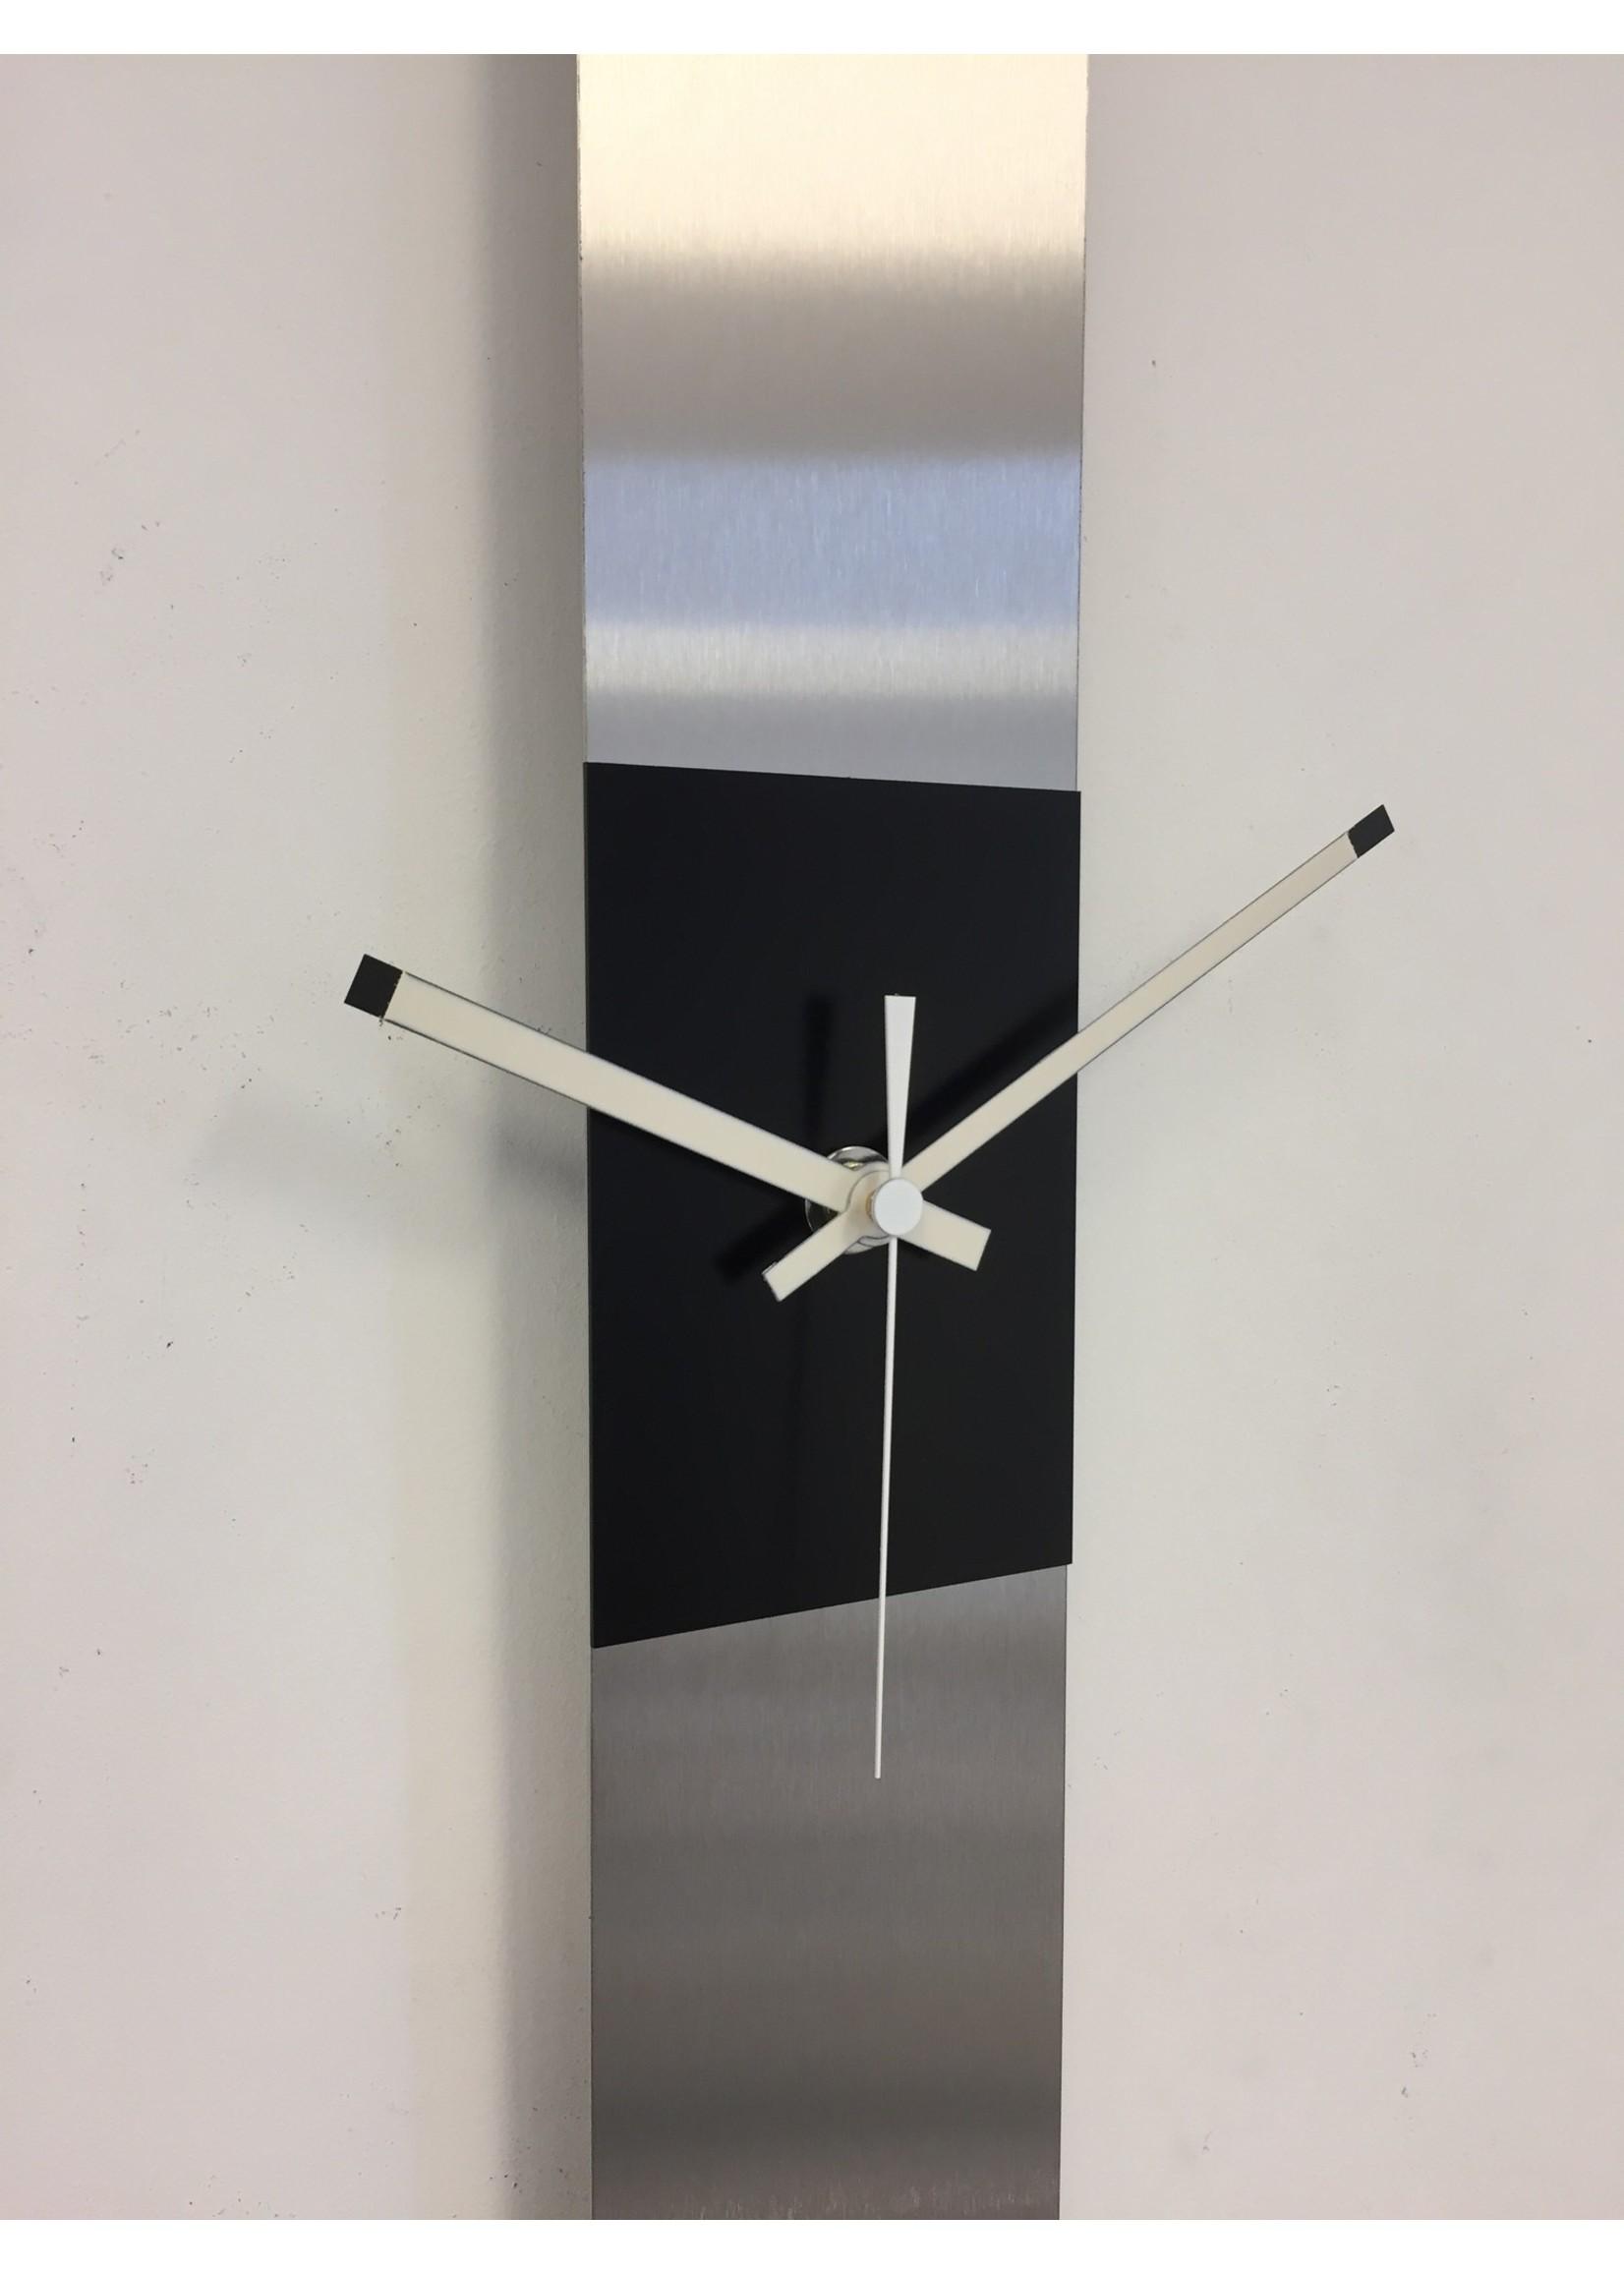 Klokkendiscounter Wandklok SUMMIT BLACK SQUARE MODERN DUTCH DESIGN